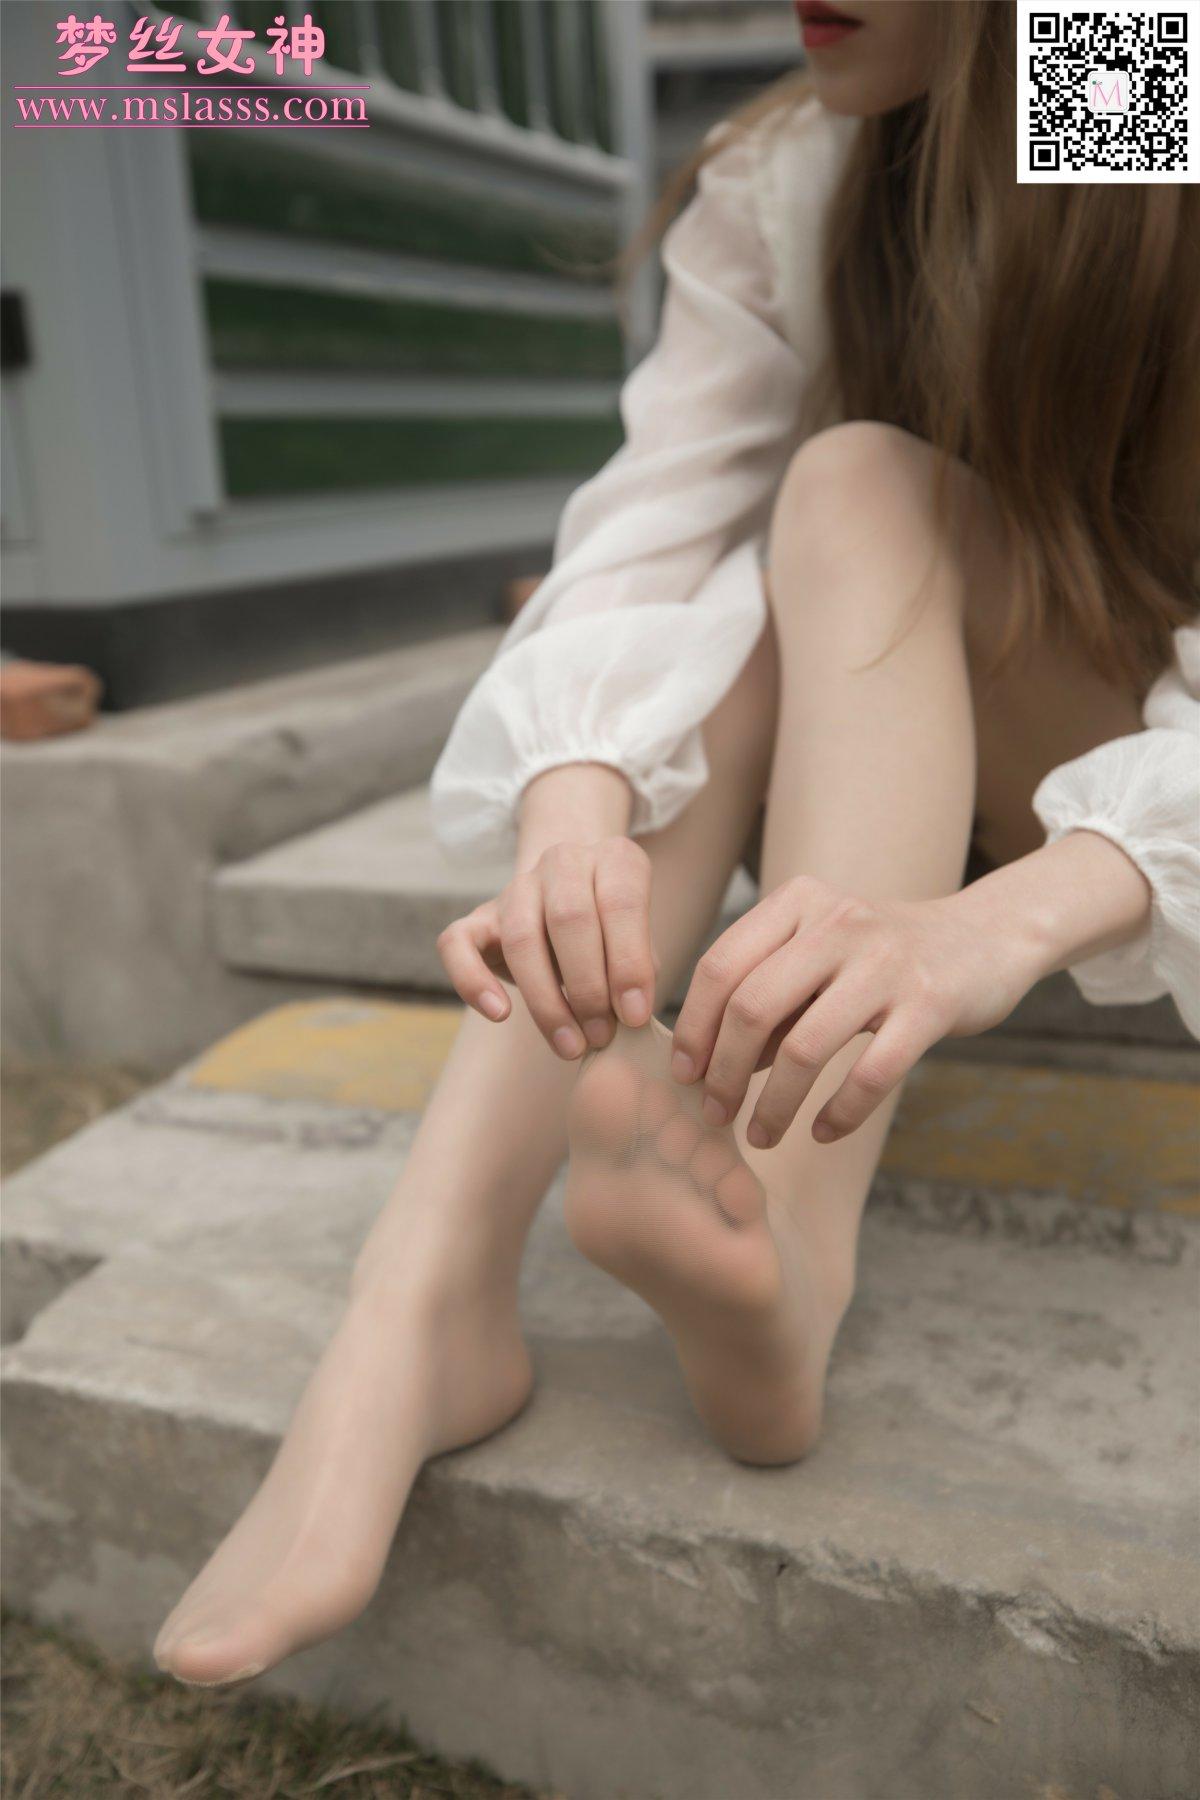 [MSLASS]梦丝女神 – 晓晓 女神的丝袜